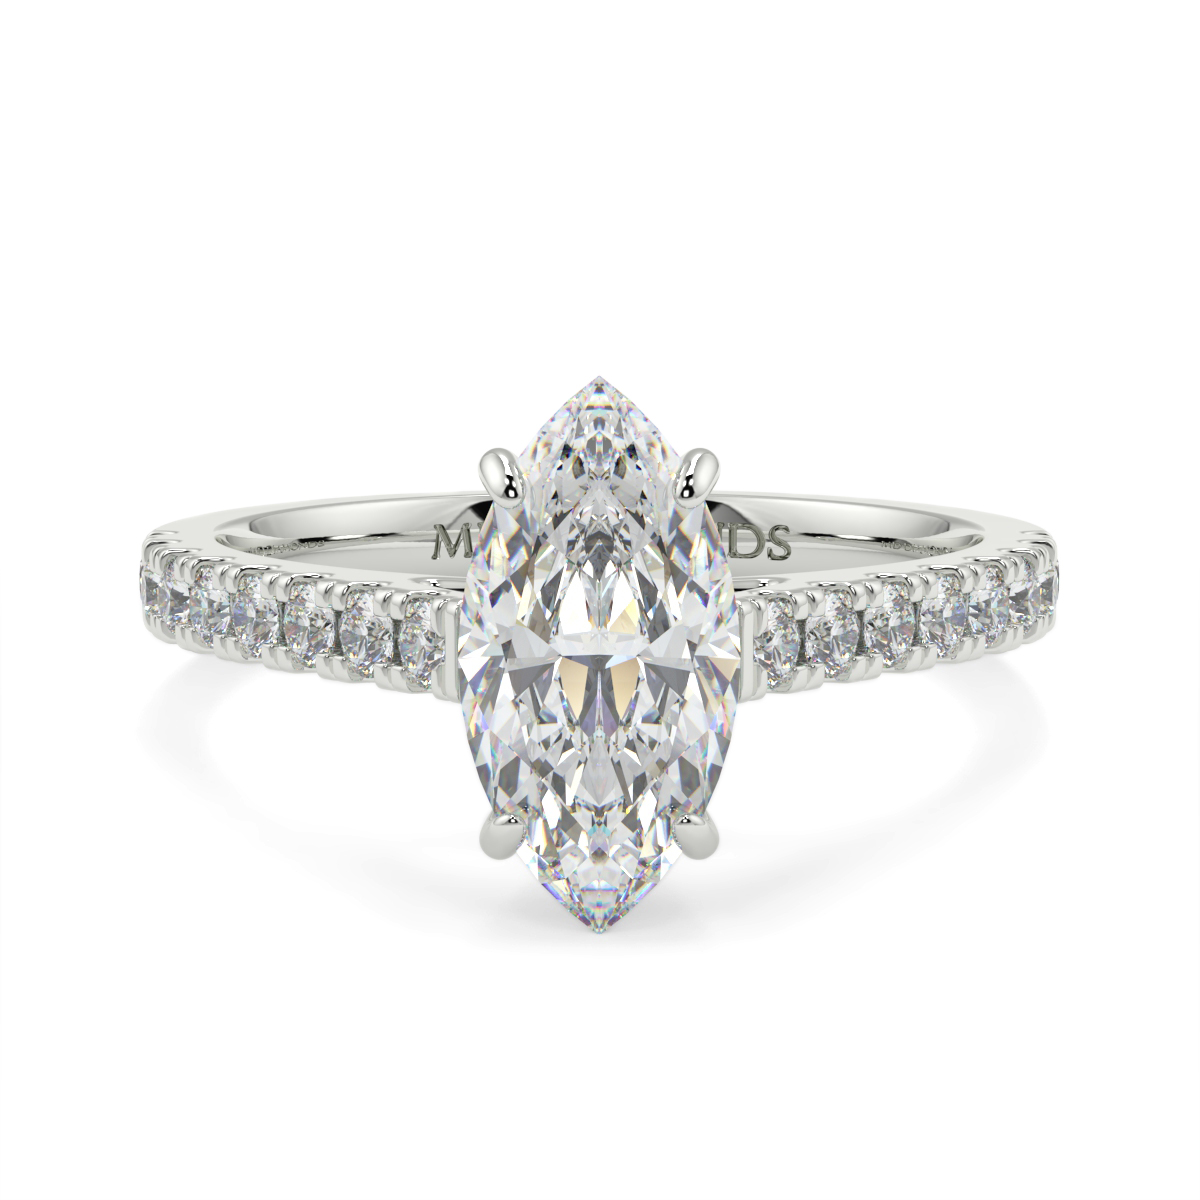 Marquise Microset Diamond Ring